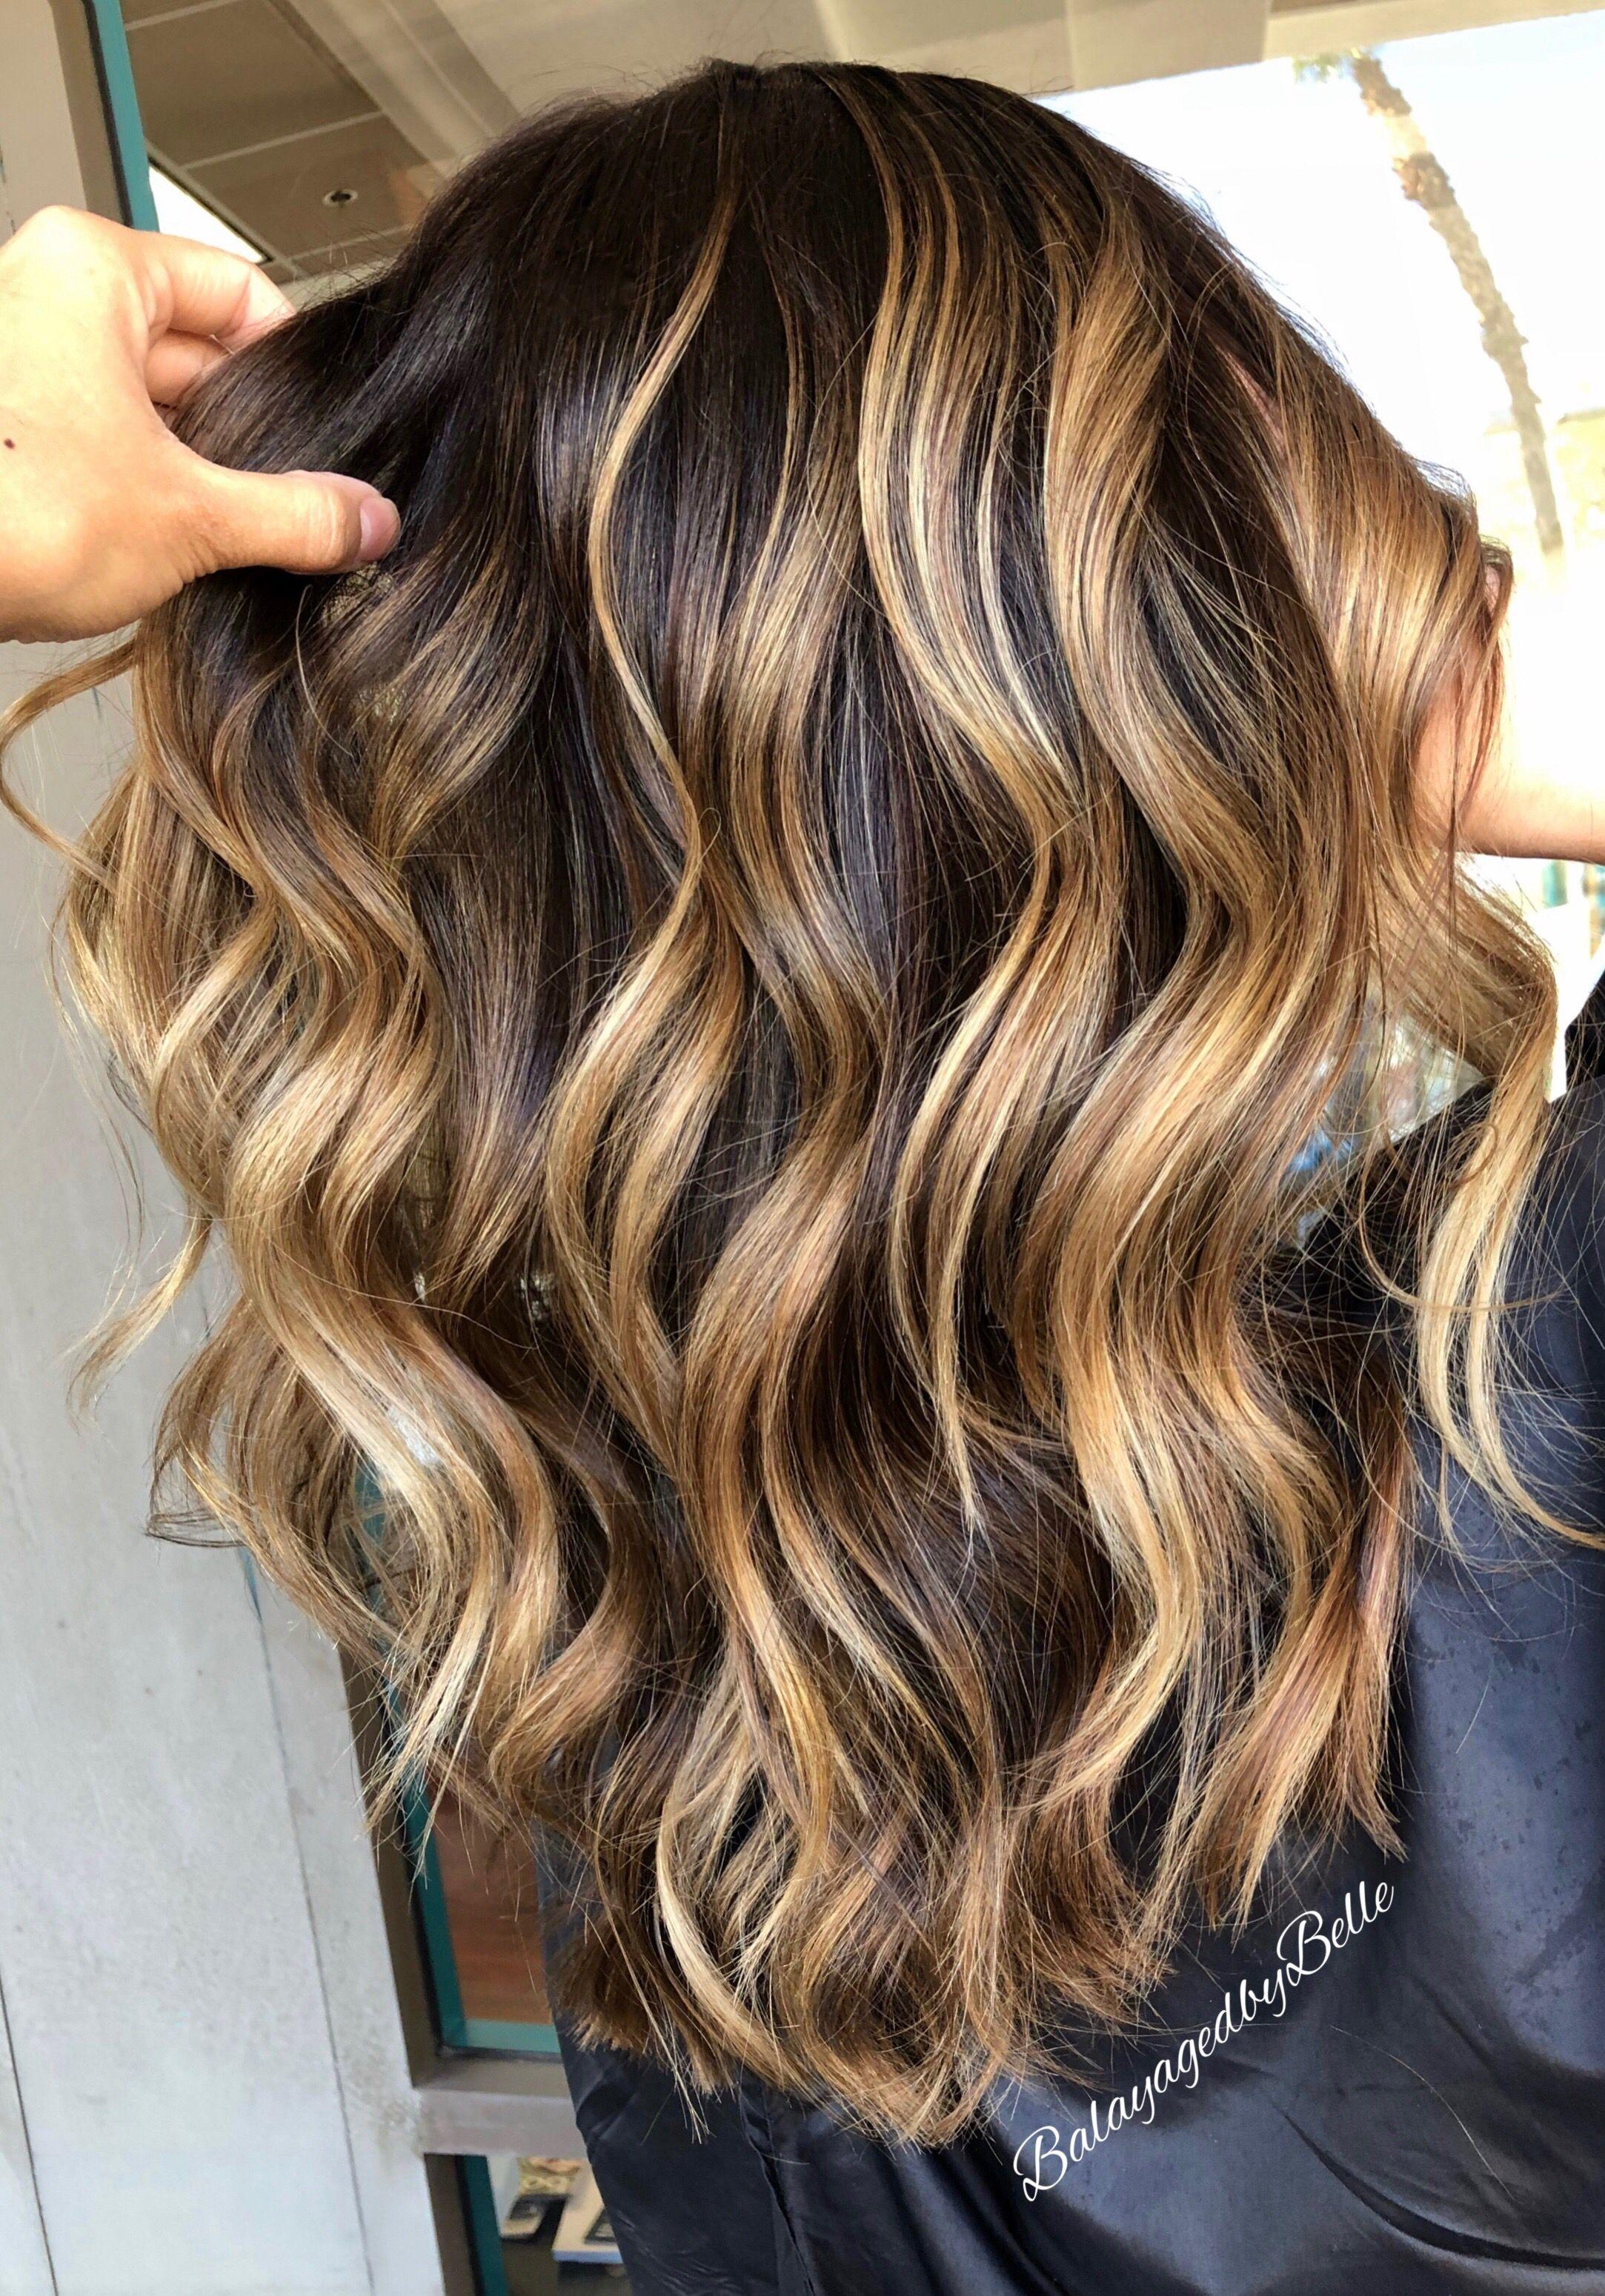 Brunette Balayage Balayage Hair Golden Highlights Brown Hair Balayage Brunette